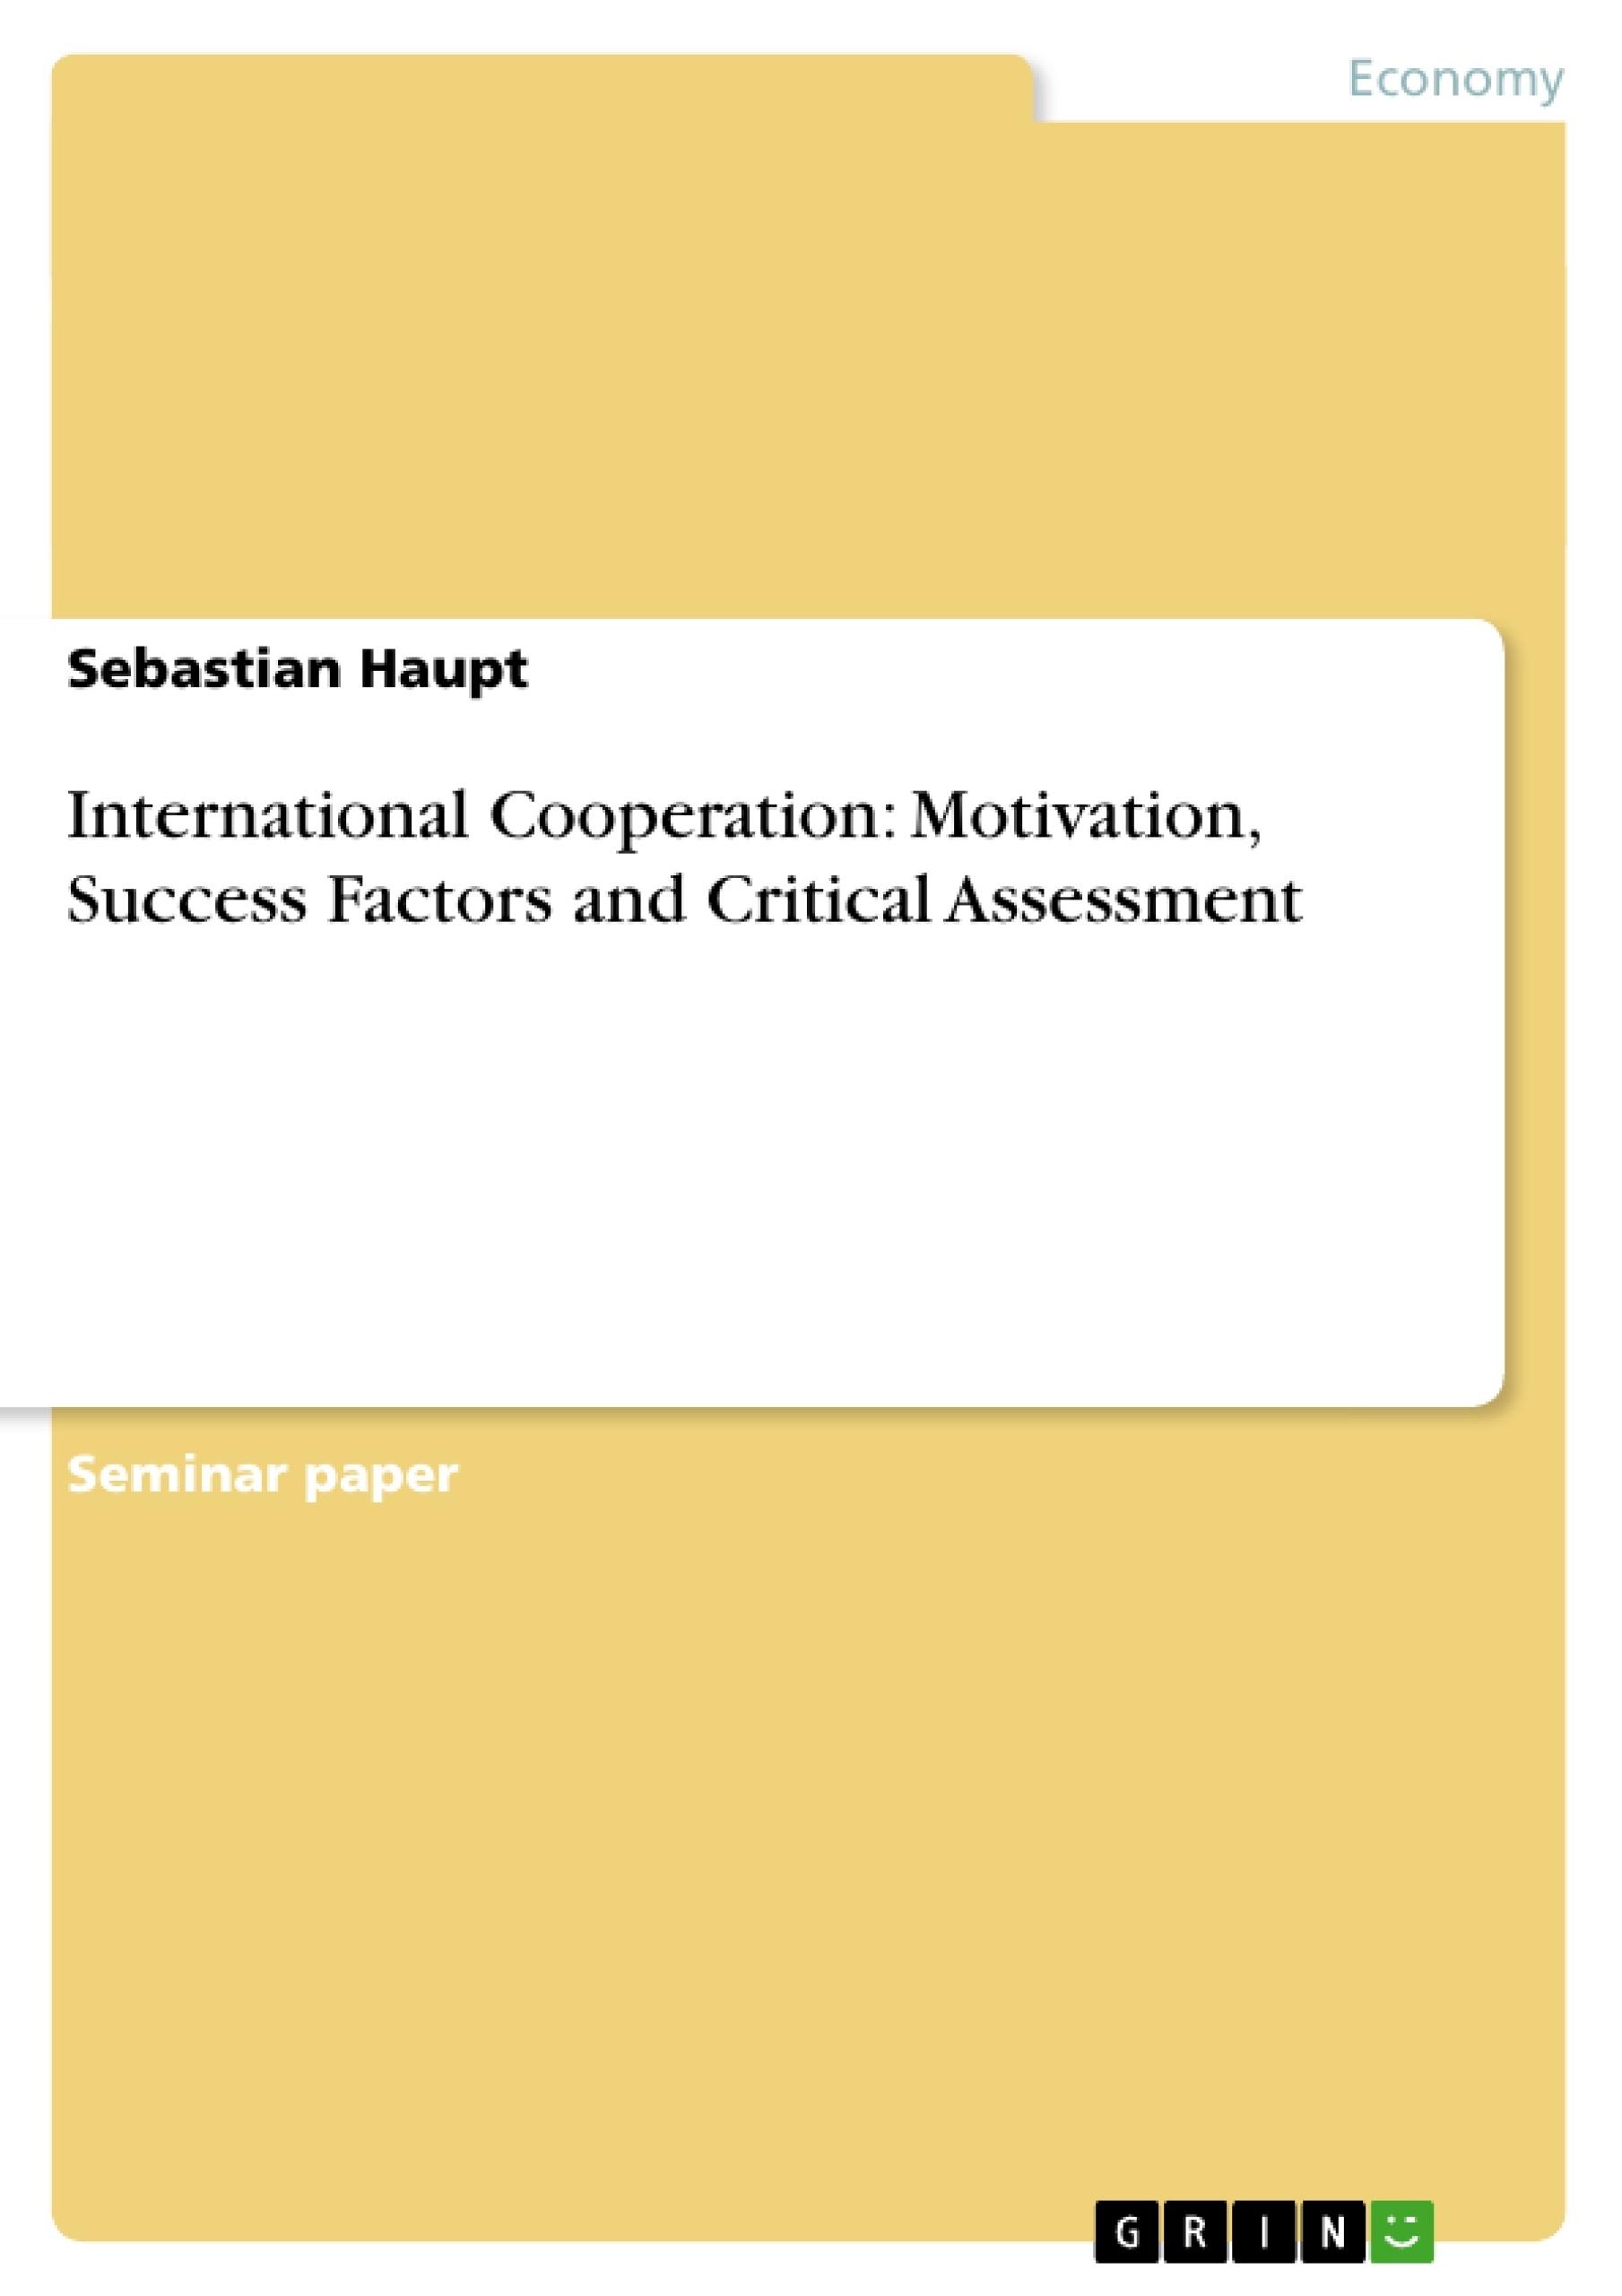 Title: International Cooperation: Motivation, Success Factors and Critical Assessment